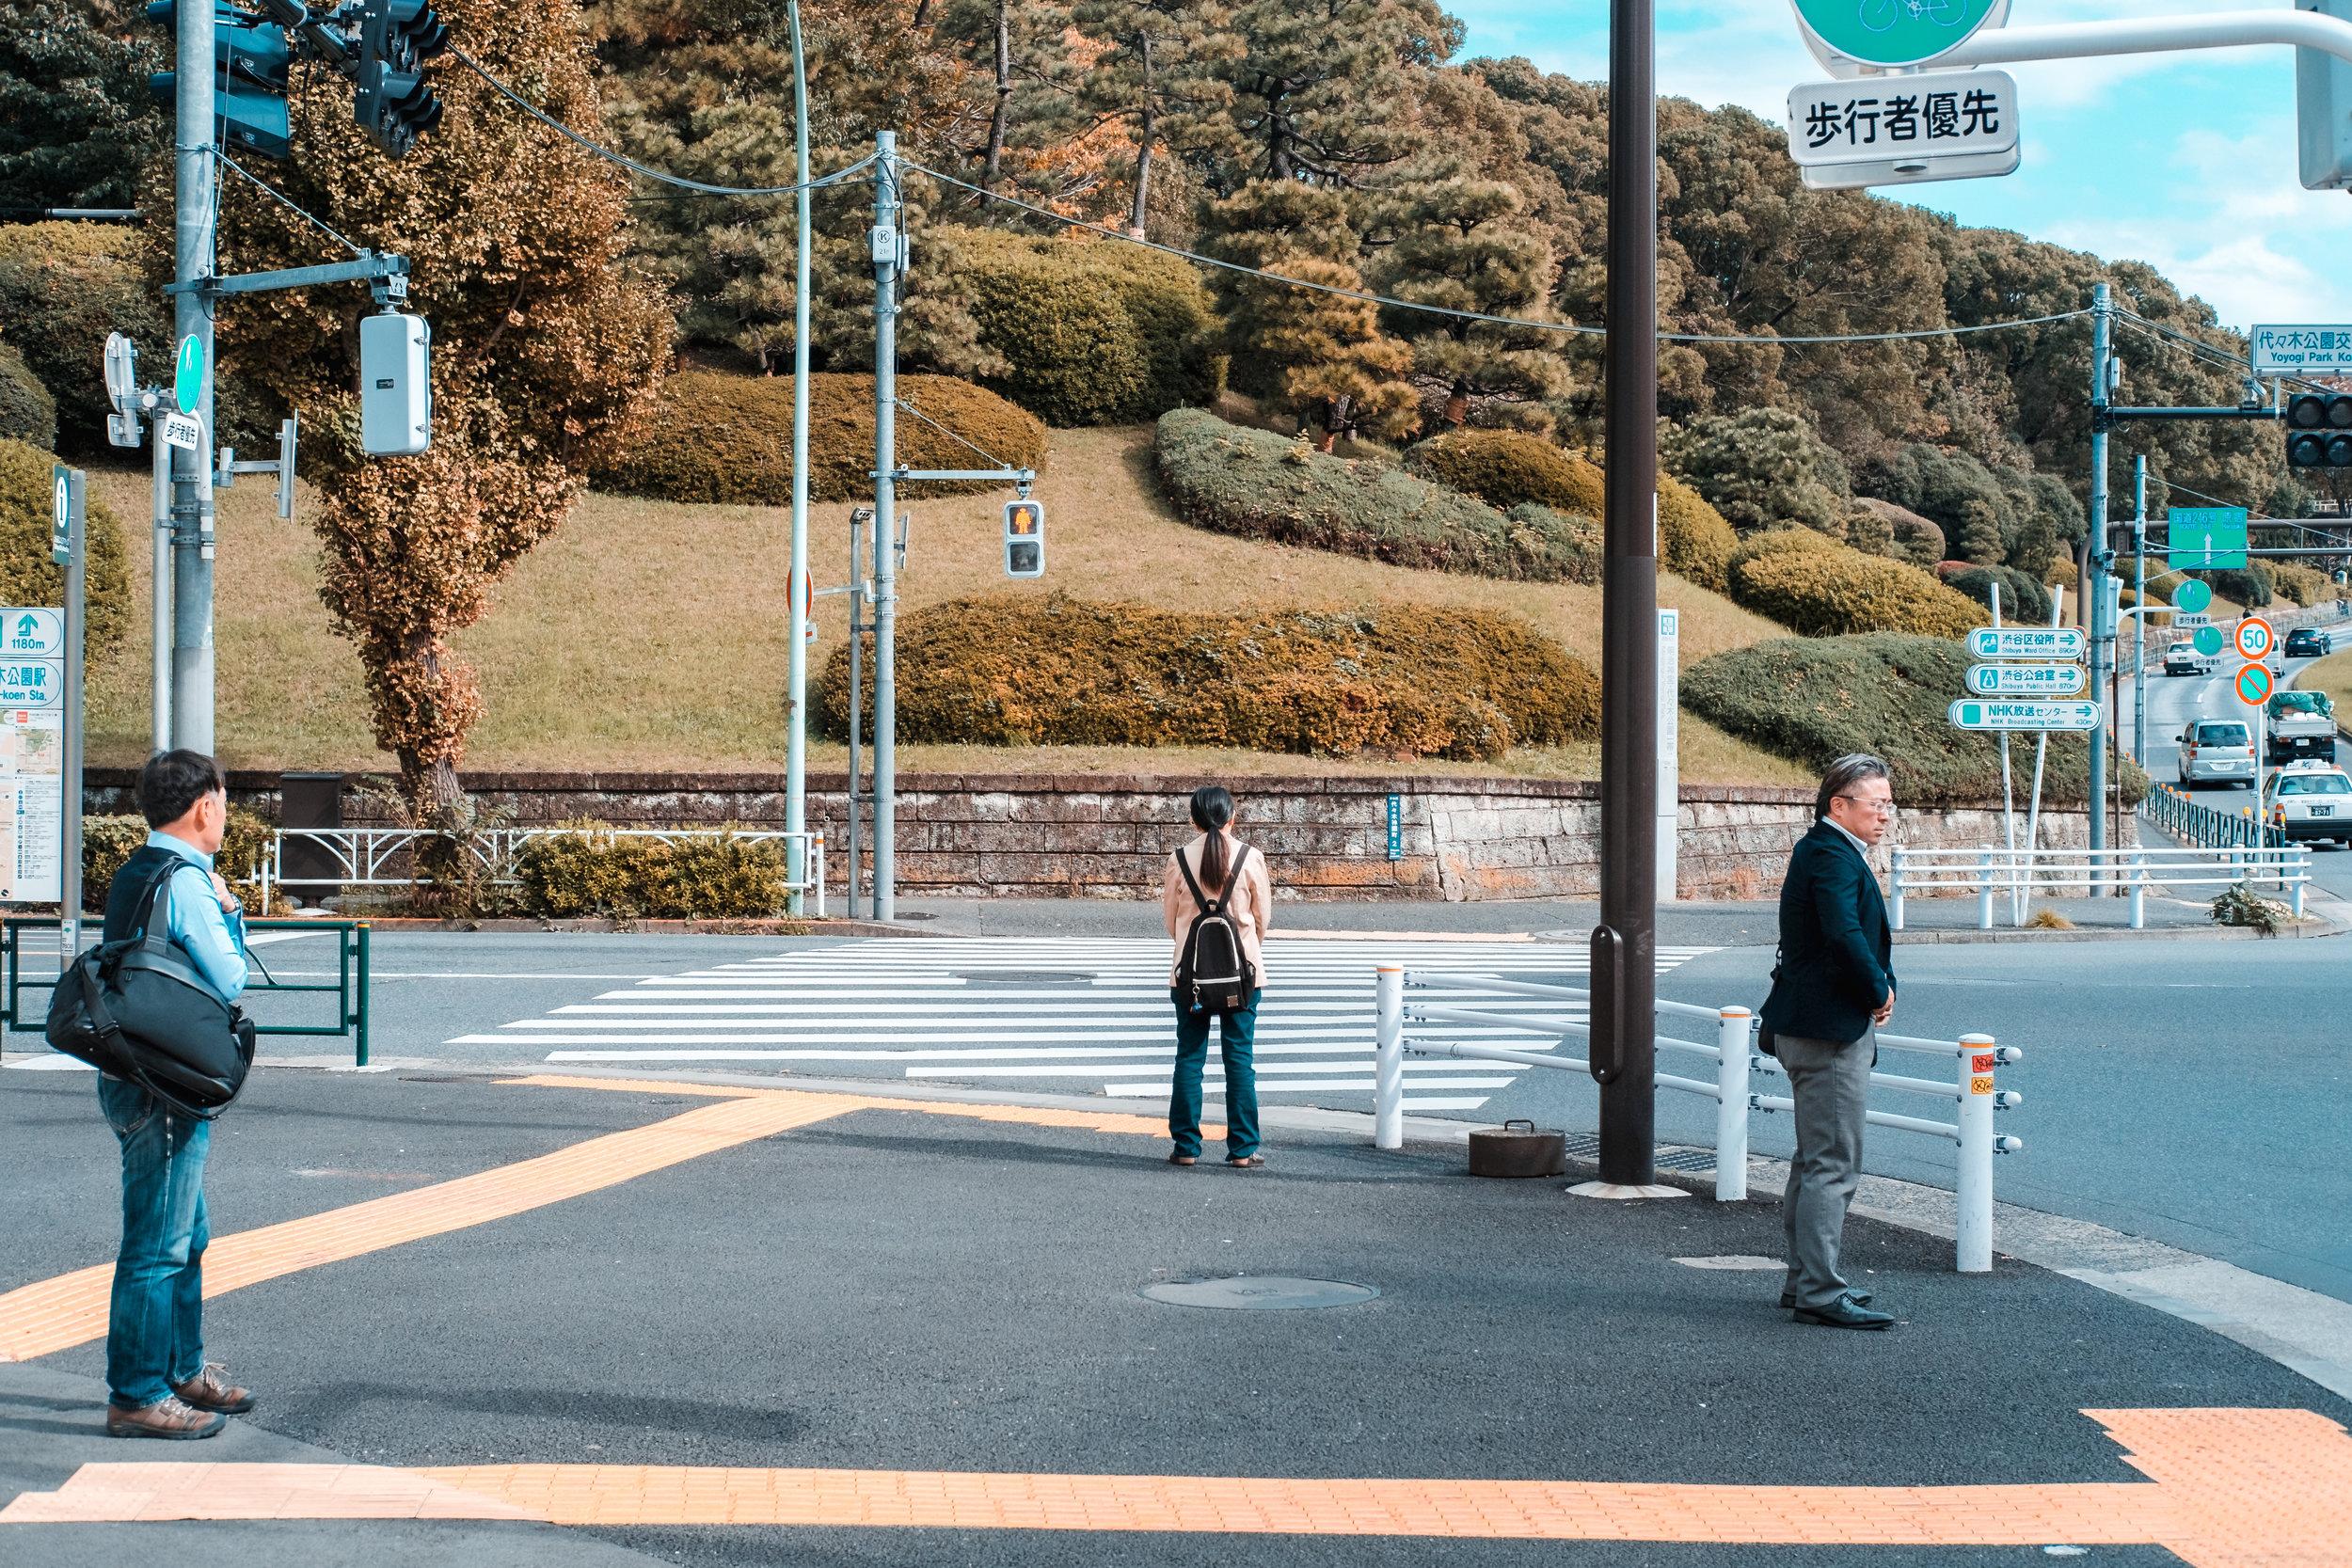 Tokyo_Nov_2018_AdamDillon_DSCF1128.jpg